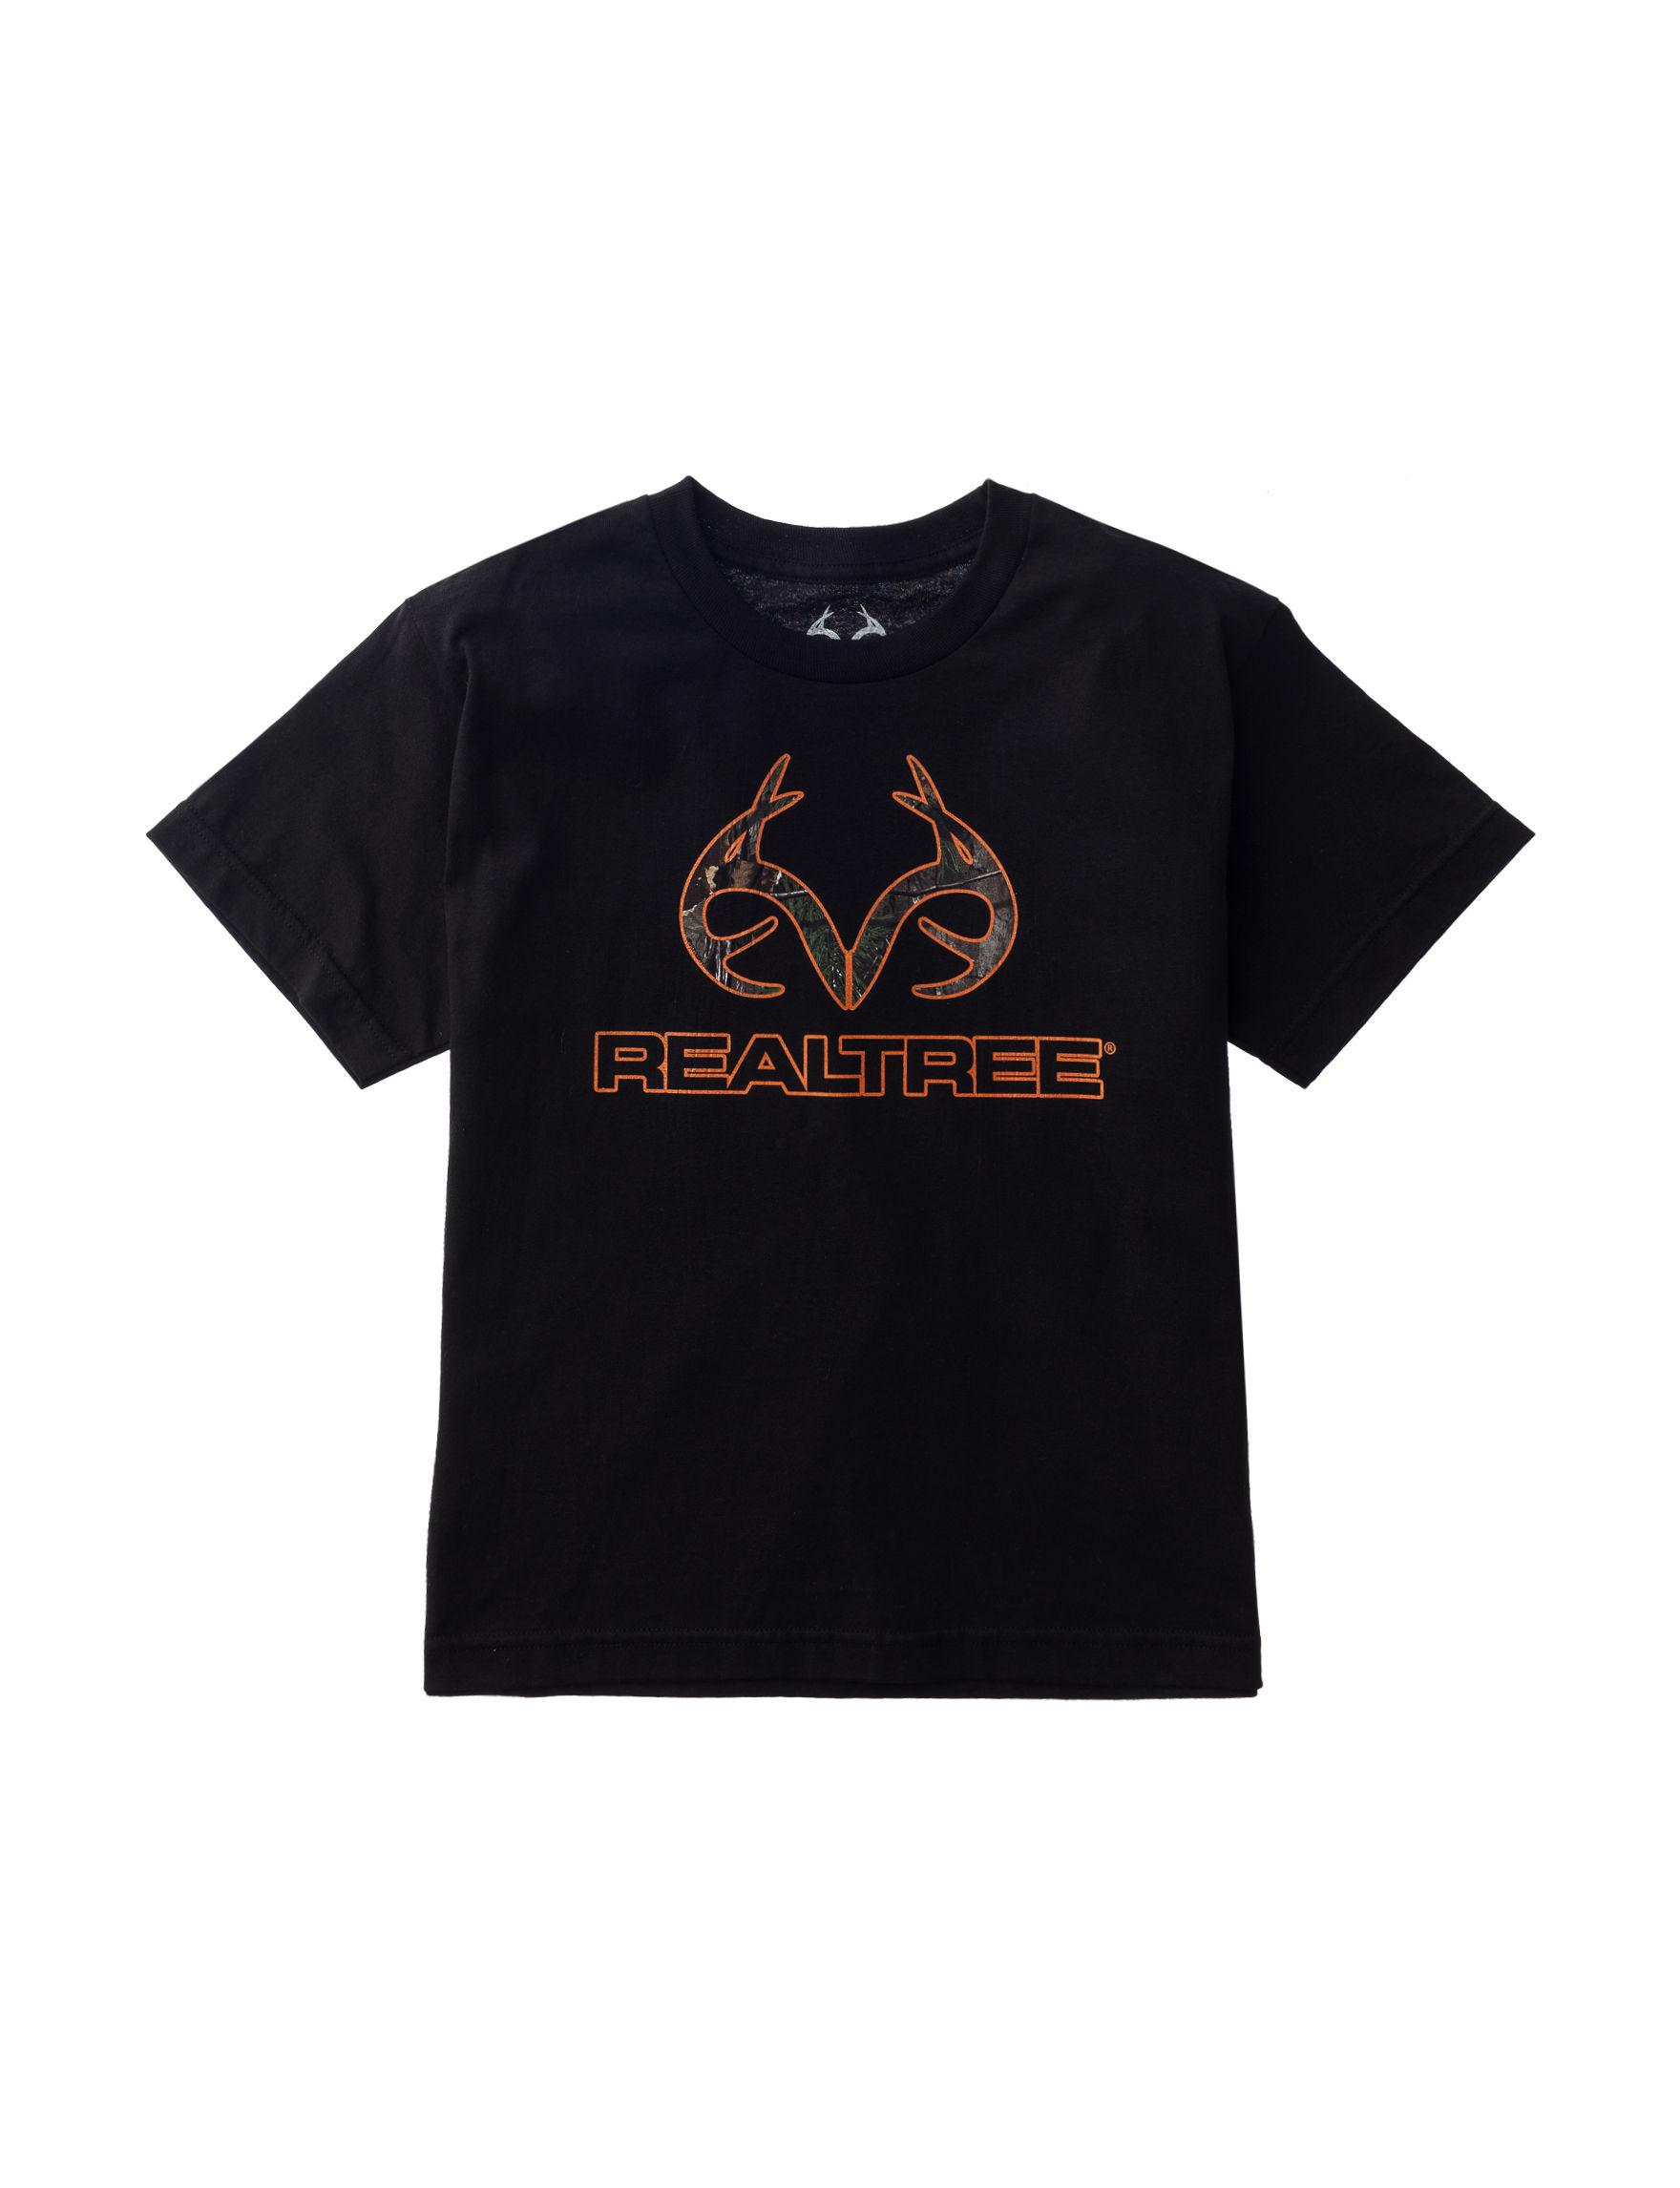 Realtree Black